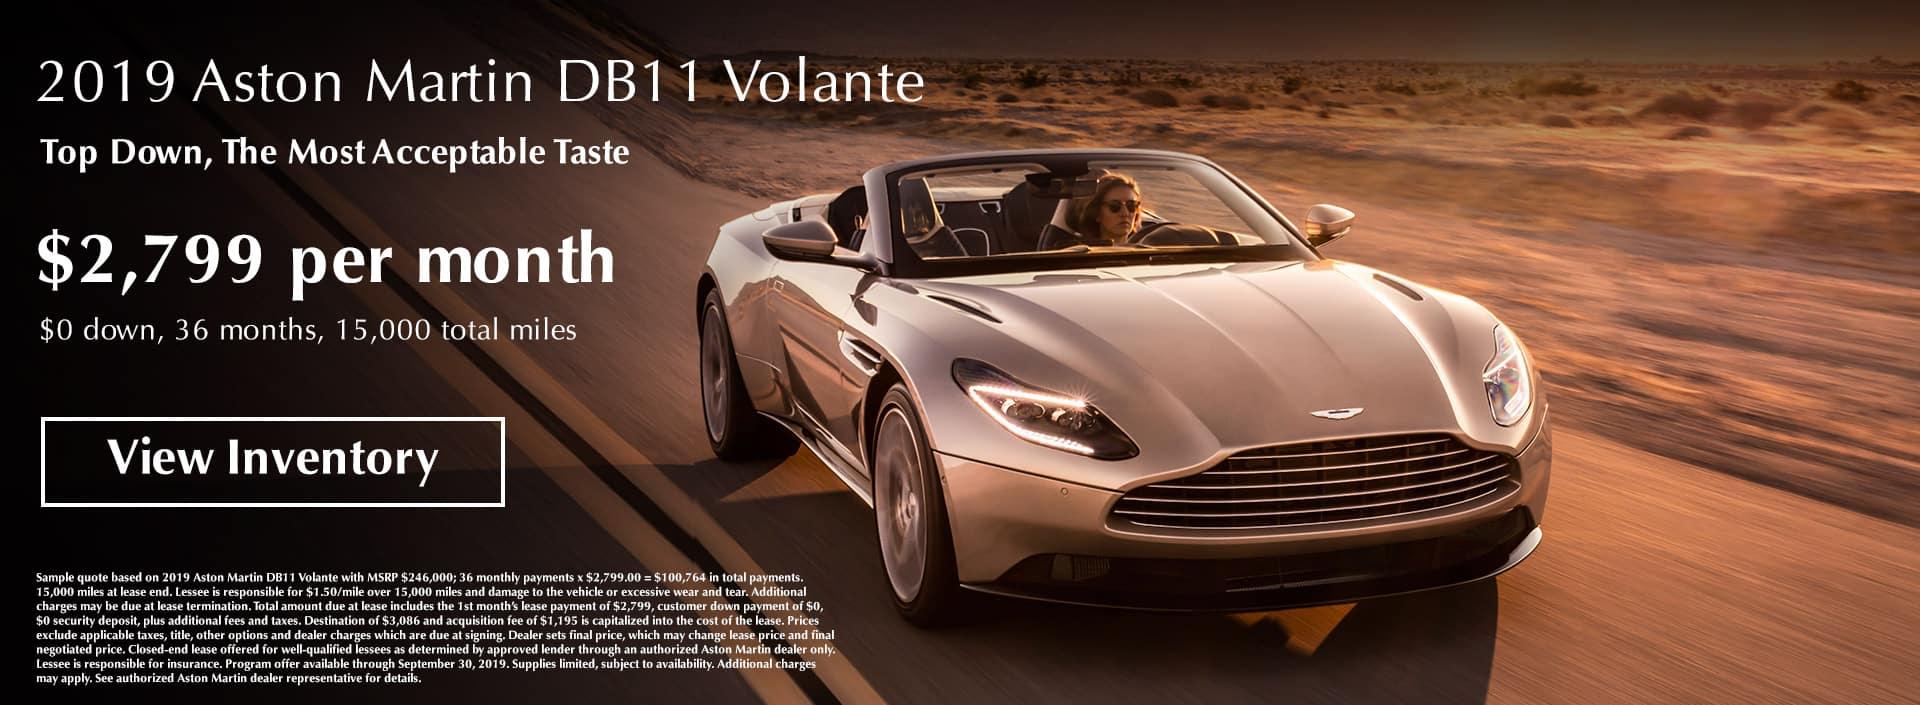 2019 Aston Martin Volante